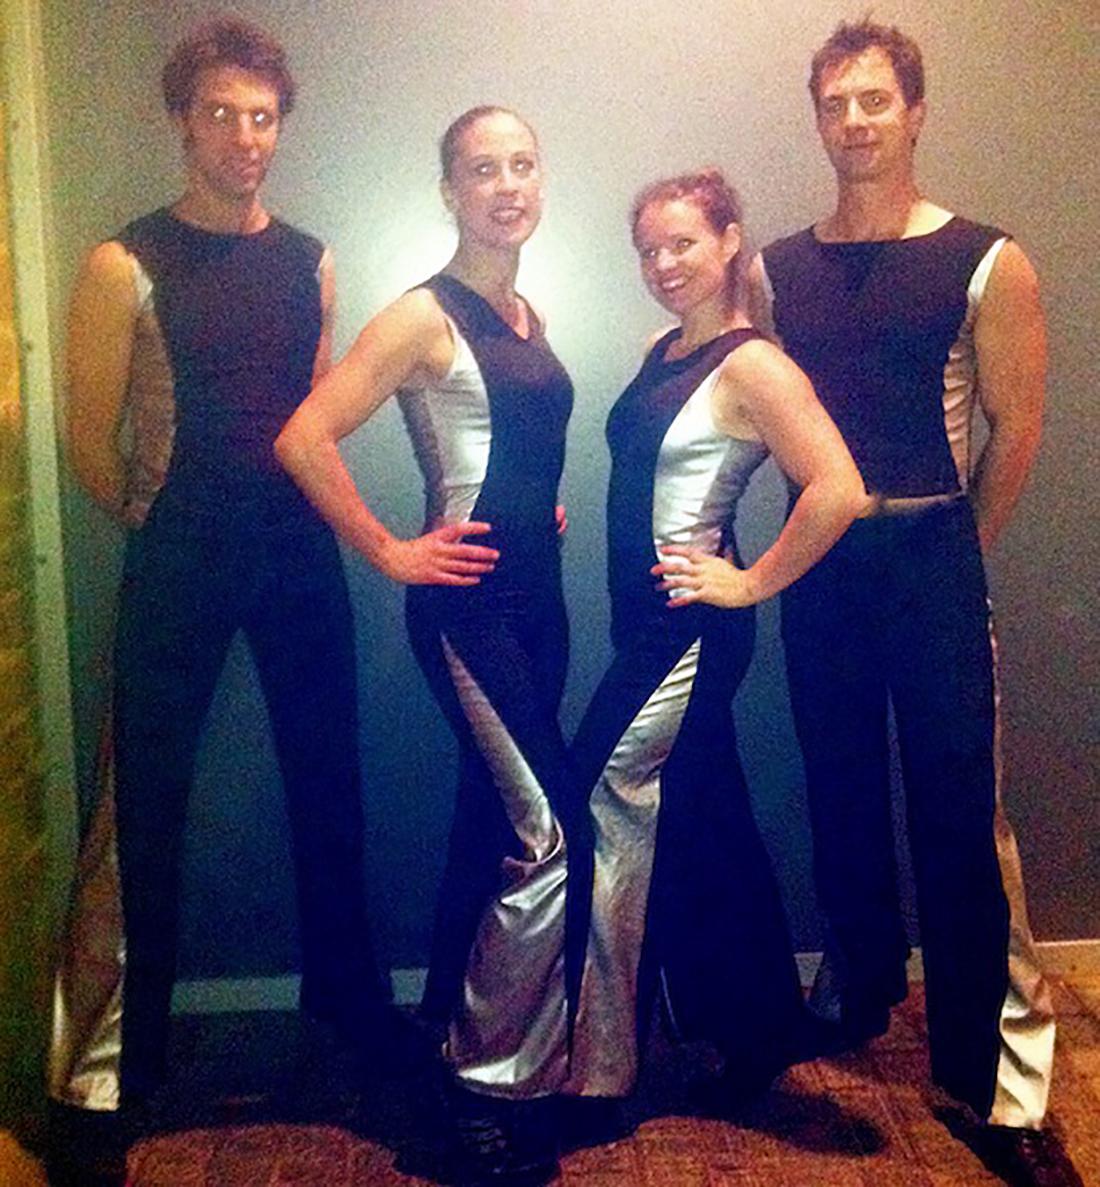 Silver & black fire costumes